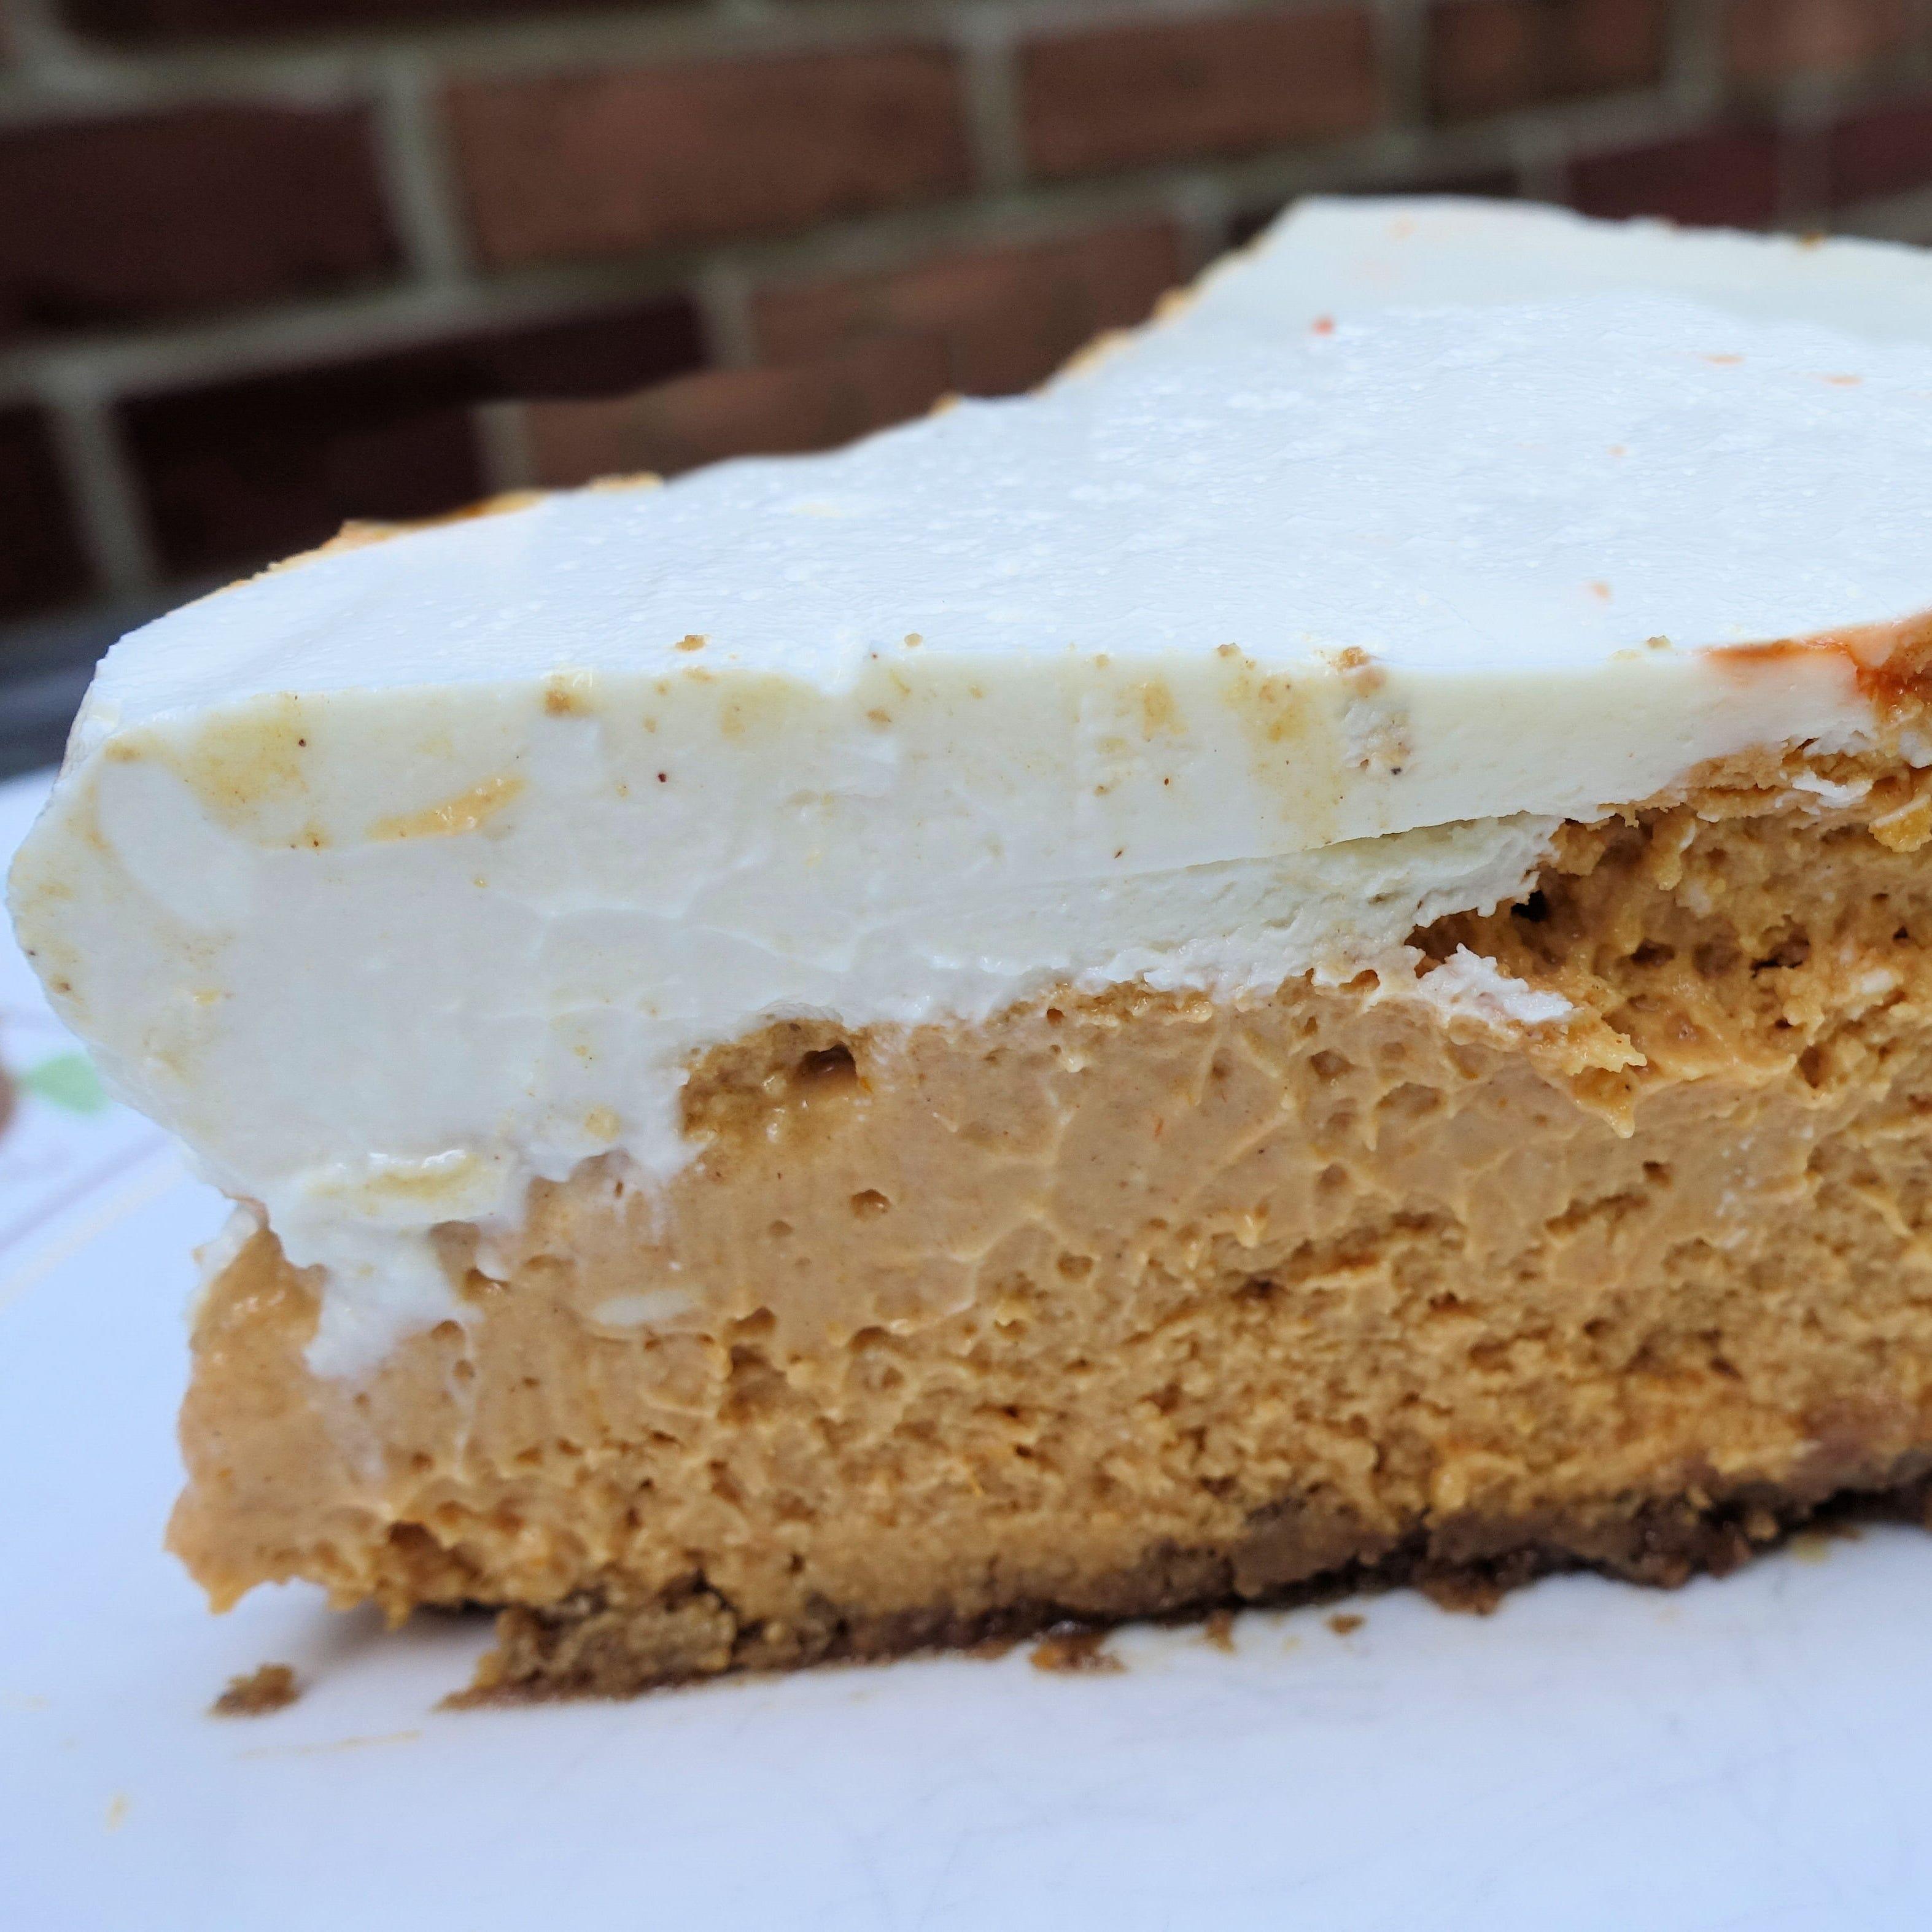 Tired of pumpkin pie? Try pumpkin cheesecake